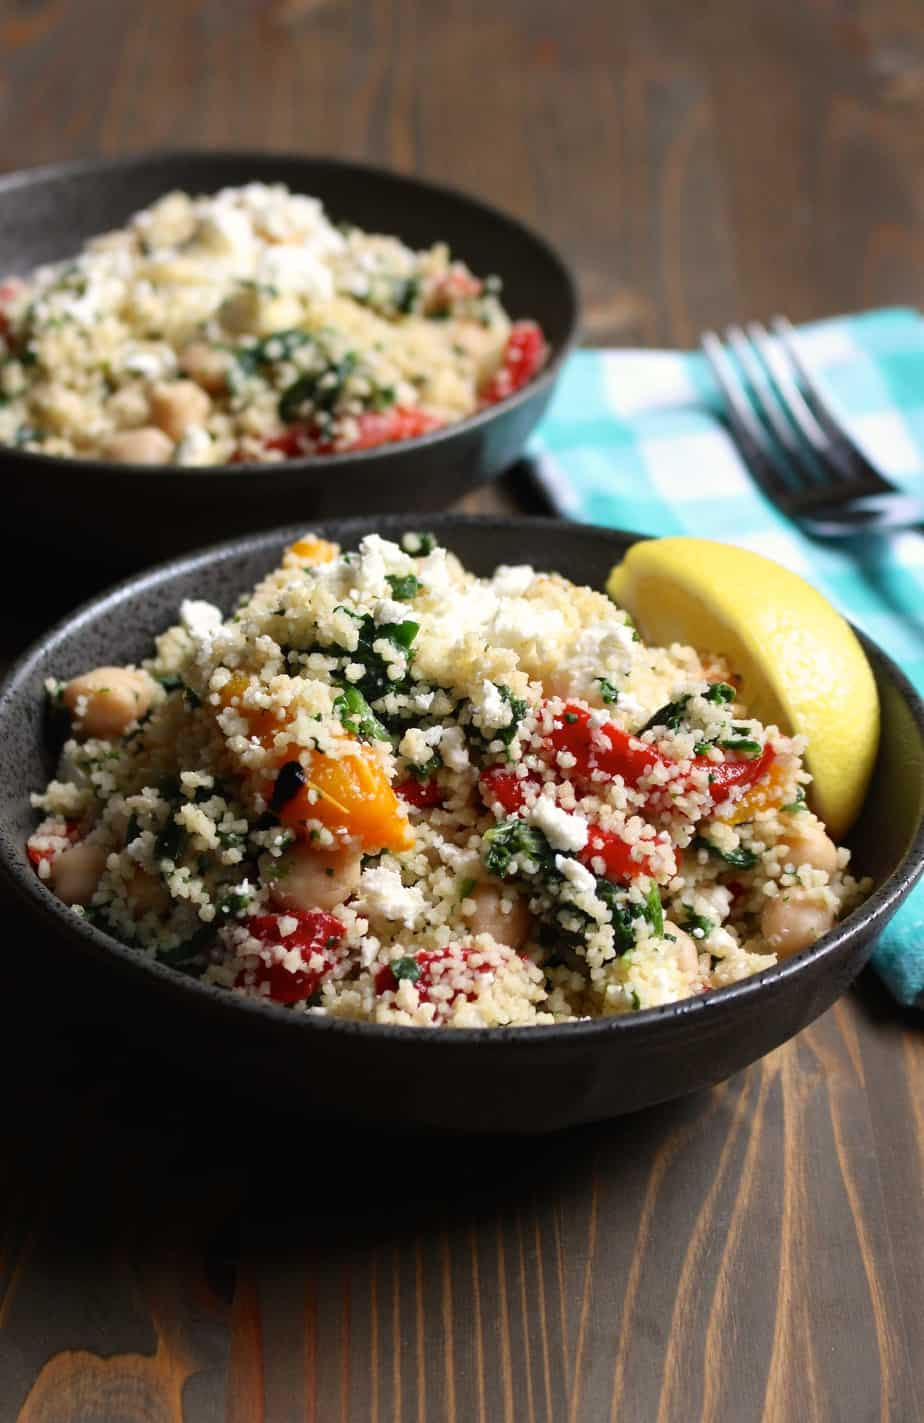 Lemon Feta Couscous (or Quinoa) With Spinach